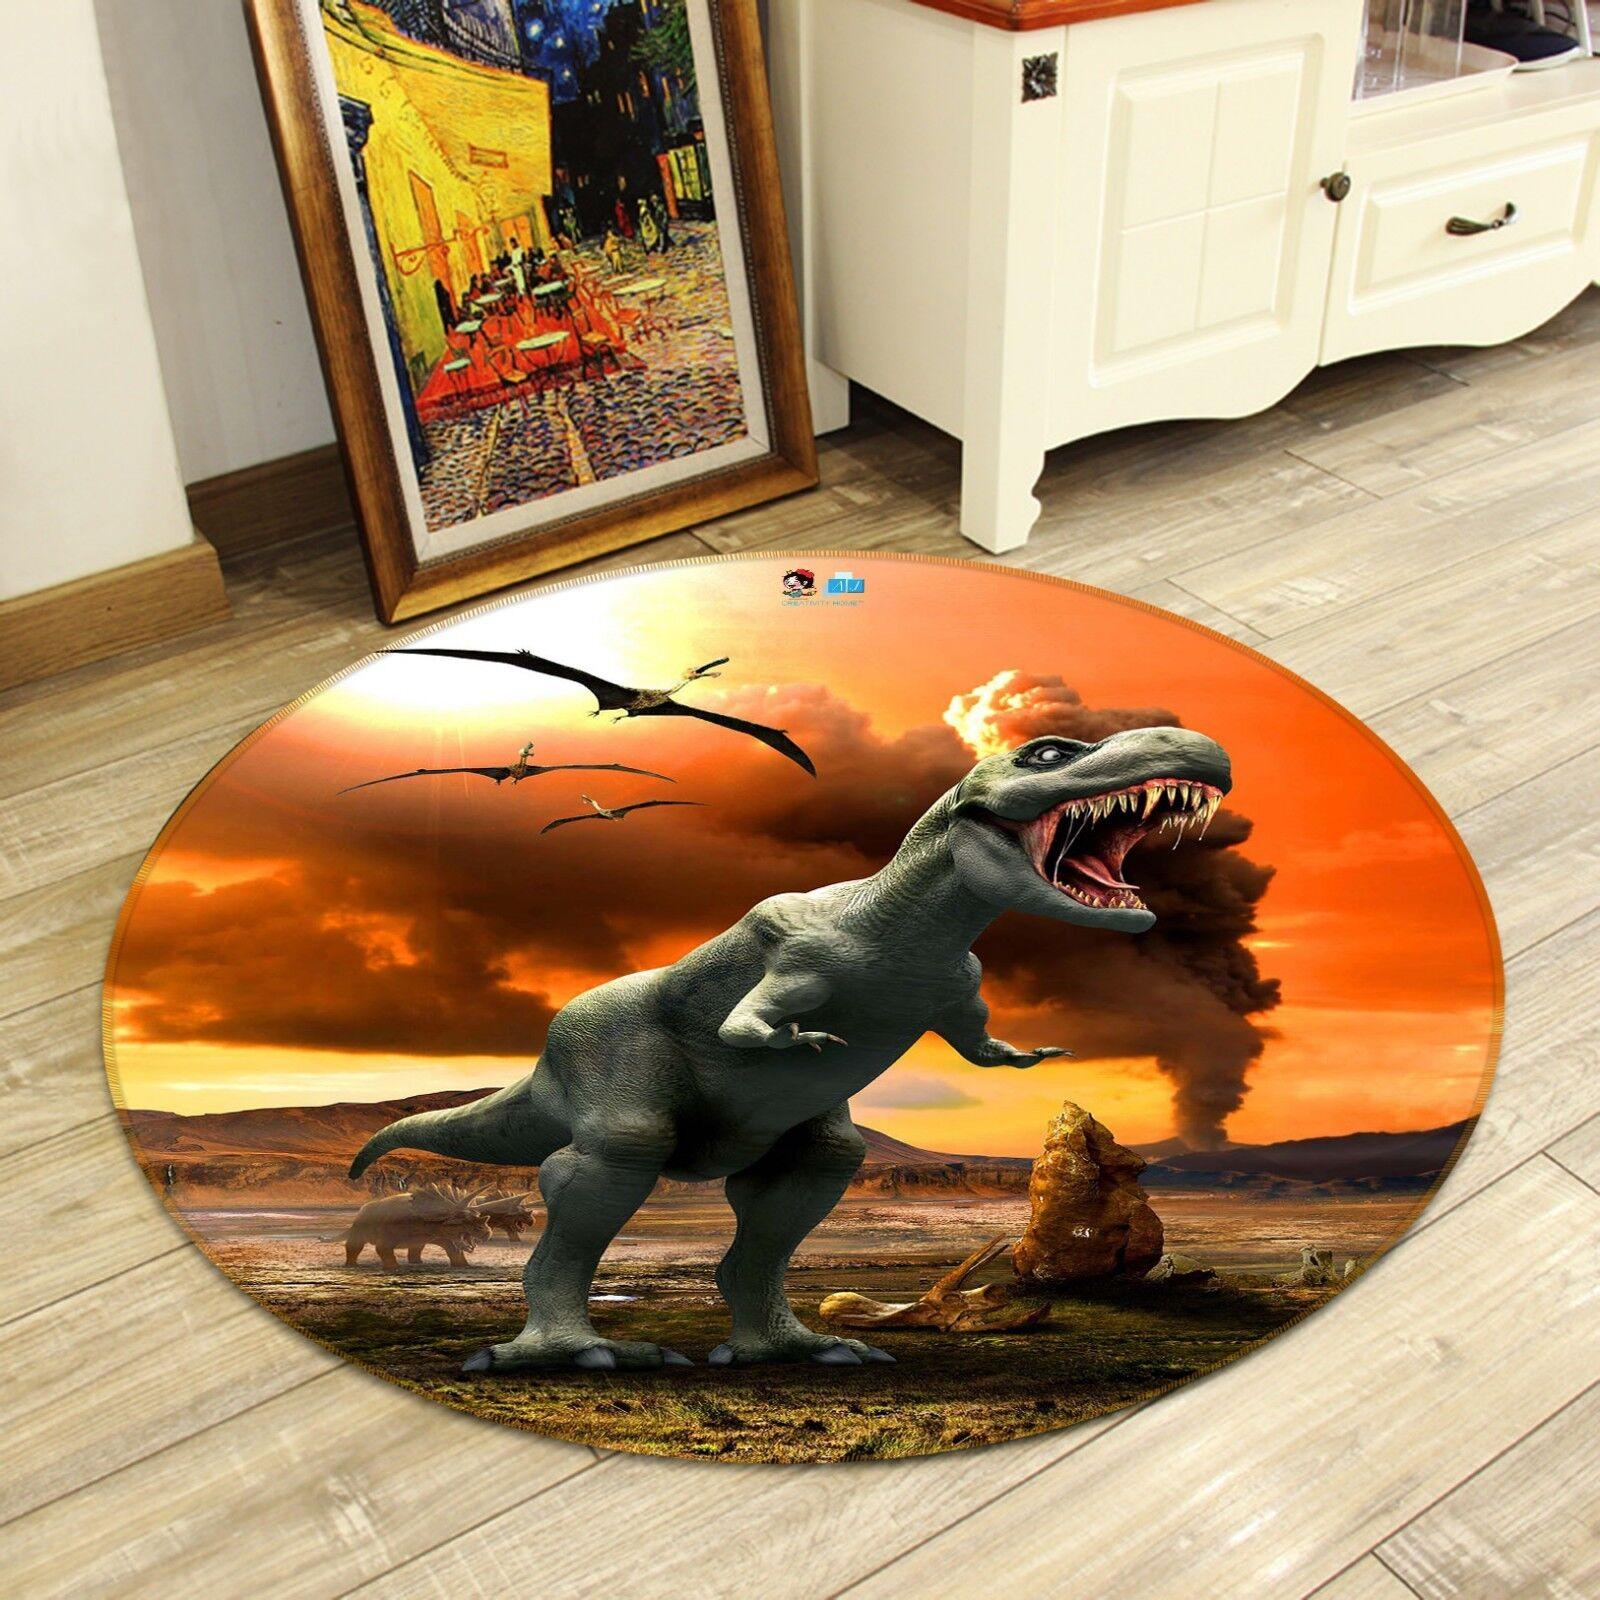 3D Dinosauro 44 tappetino antiscivolo tappeto camera Tappetino Tondo Qualità Elegante foto Tappeto UK